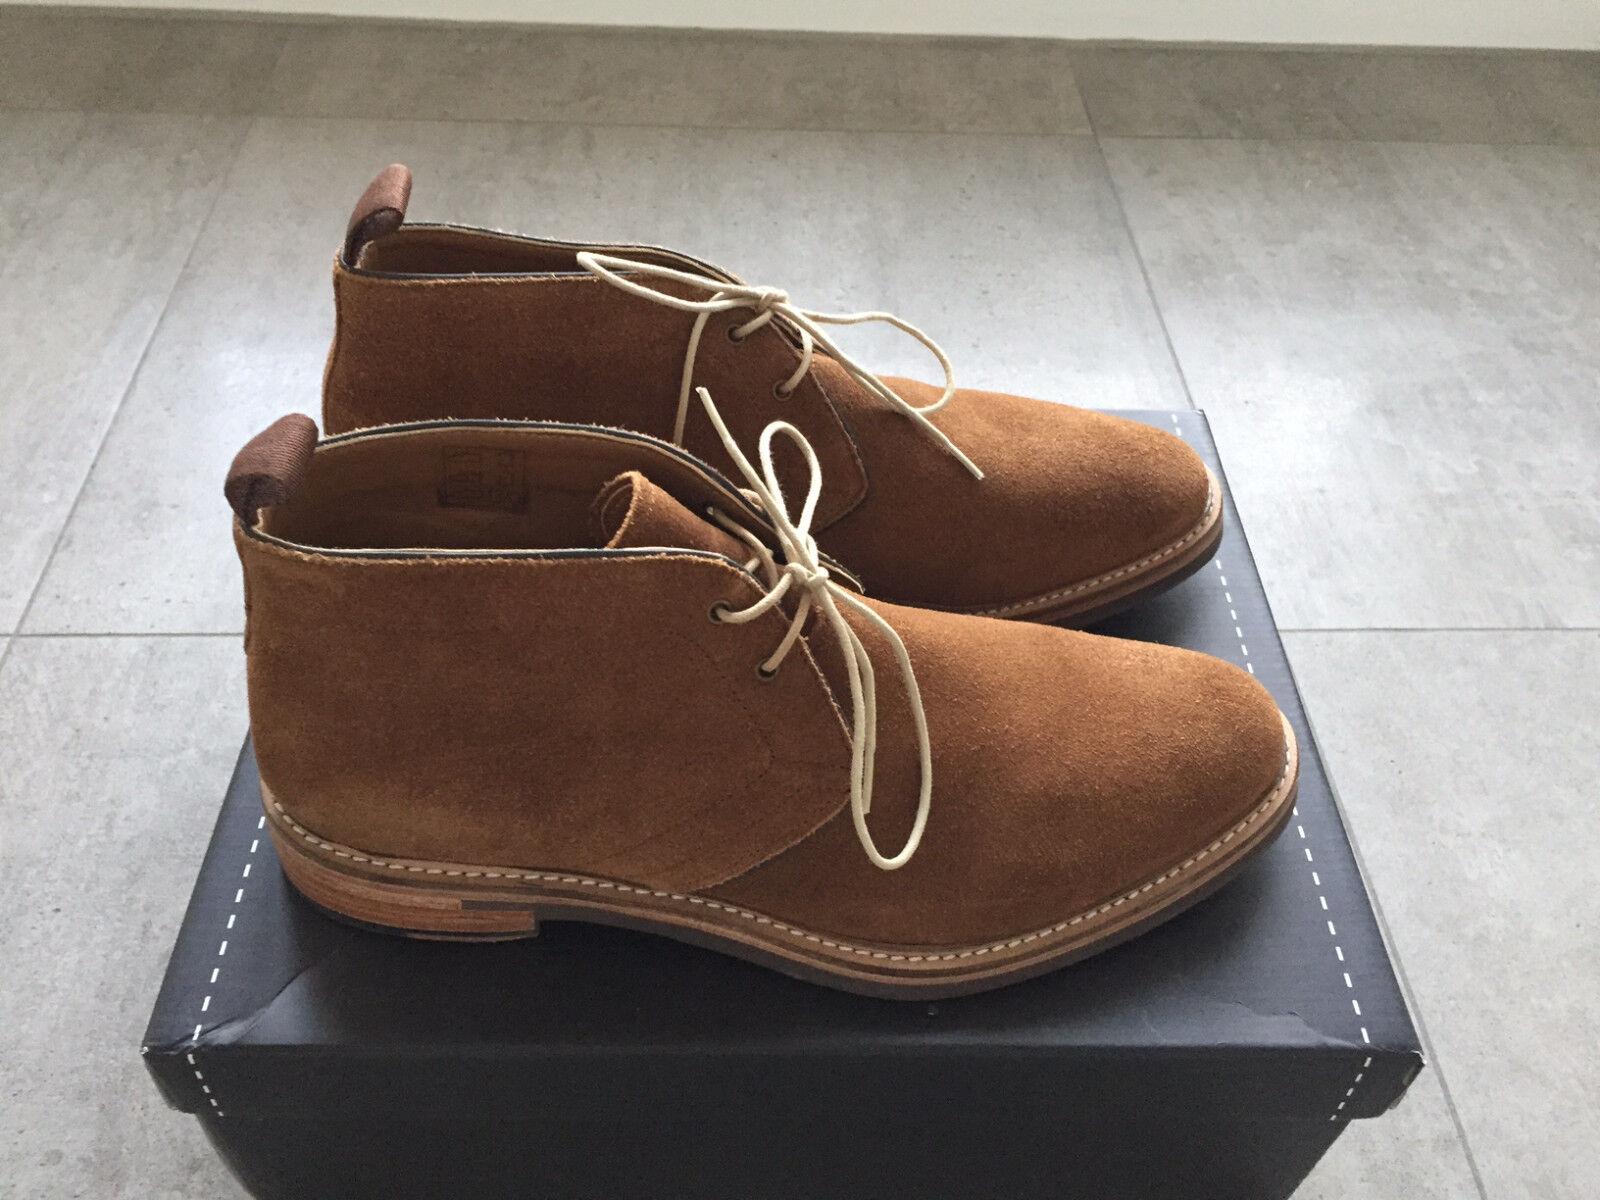 Gordon & Bros Schuhe DANILO braun NEU Herrenstiefelette Leder 623027 tabacco NEU braun 43 5697b6